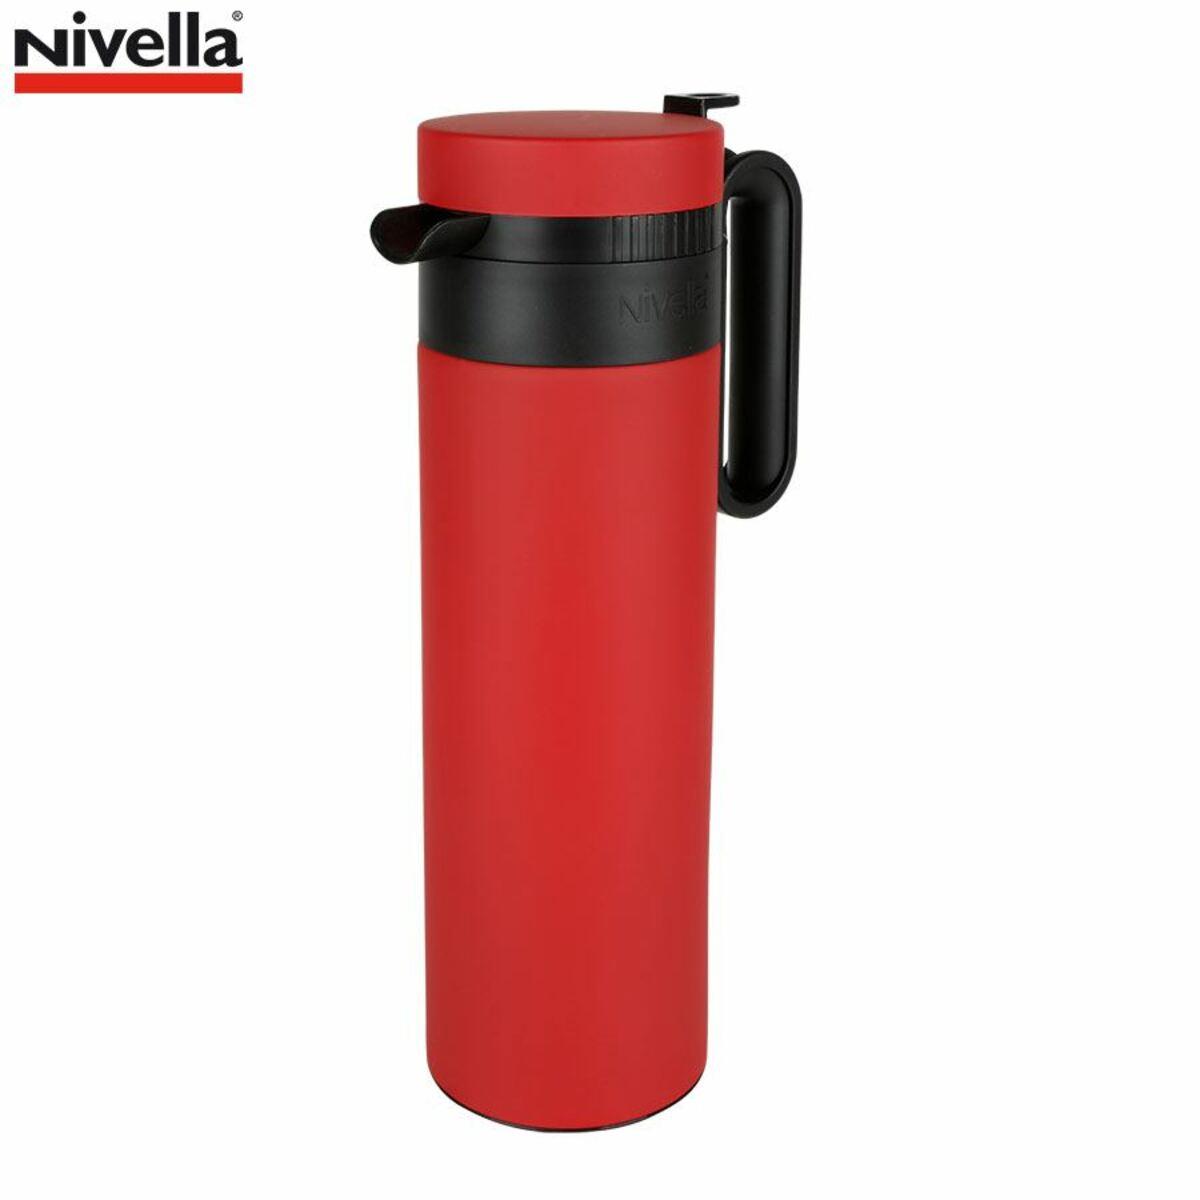 Bild 1 von Nivella Design-Isolierkanne 1,5L Rot Matt